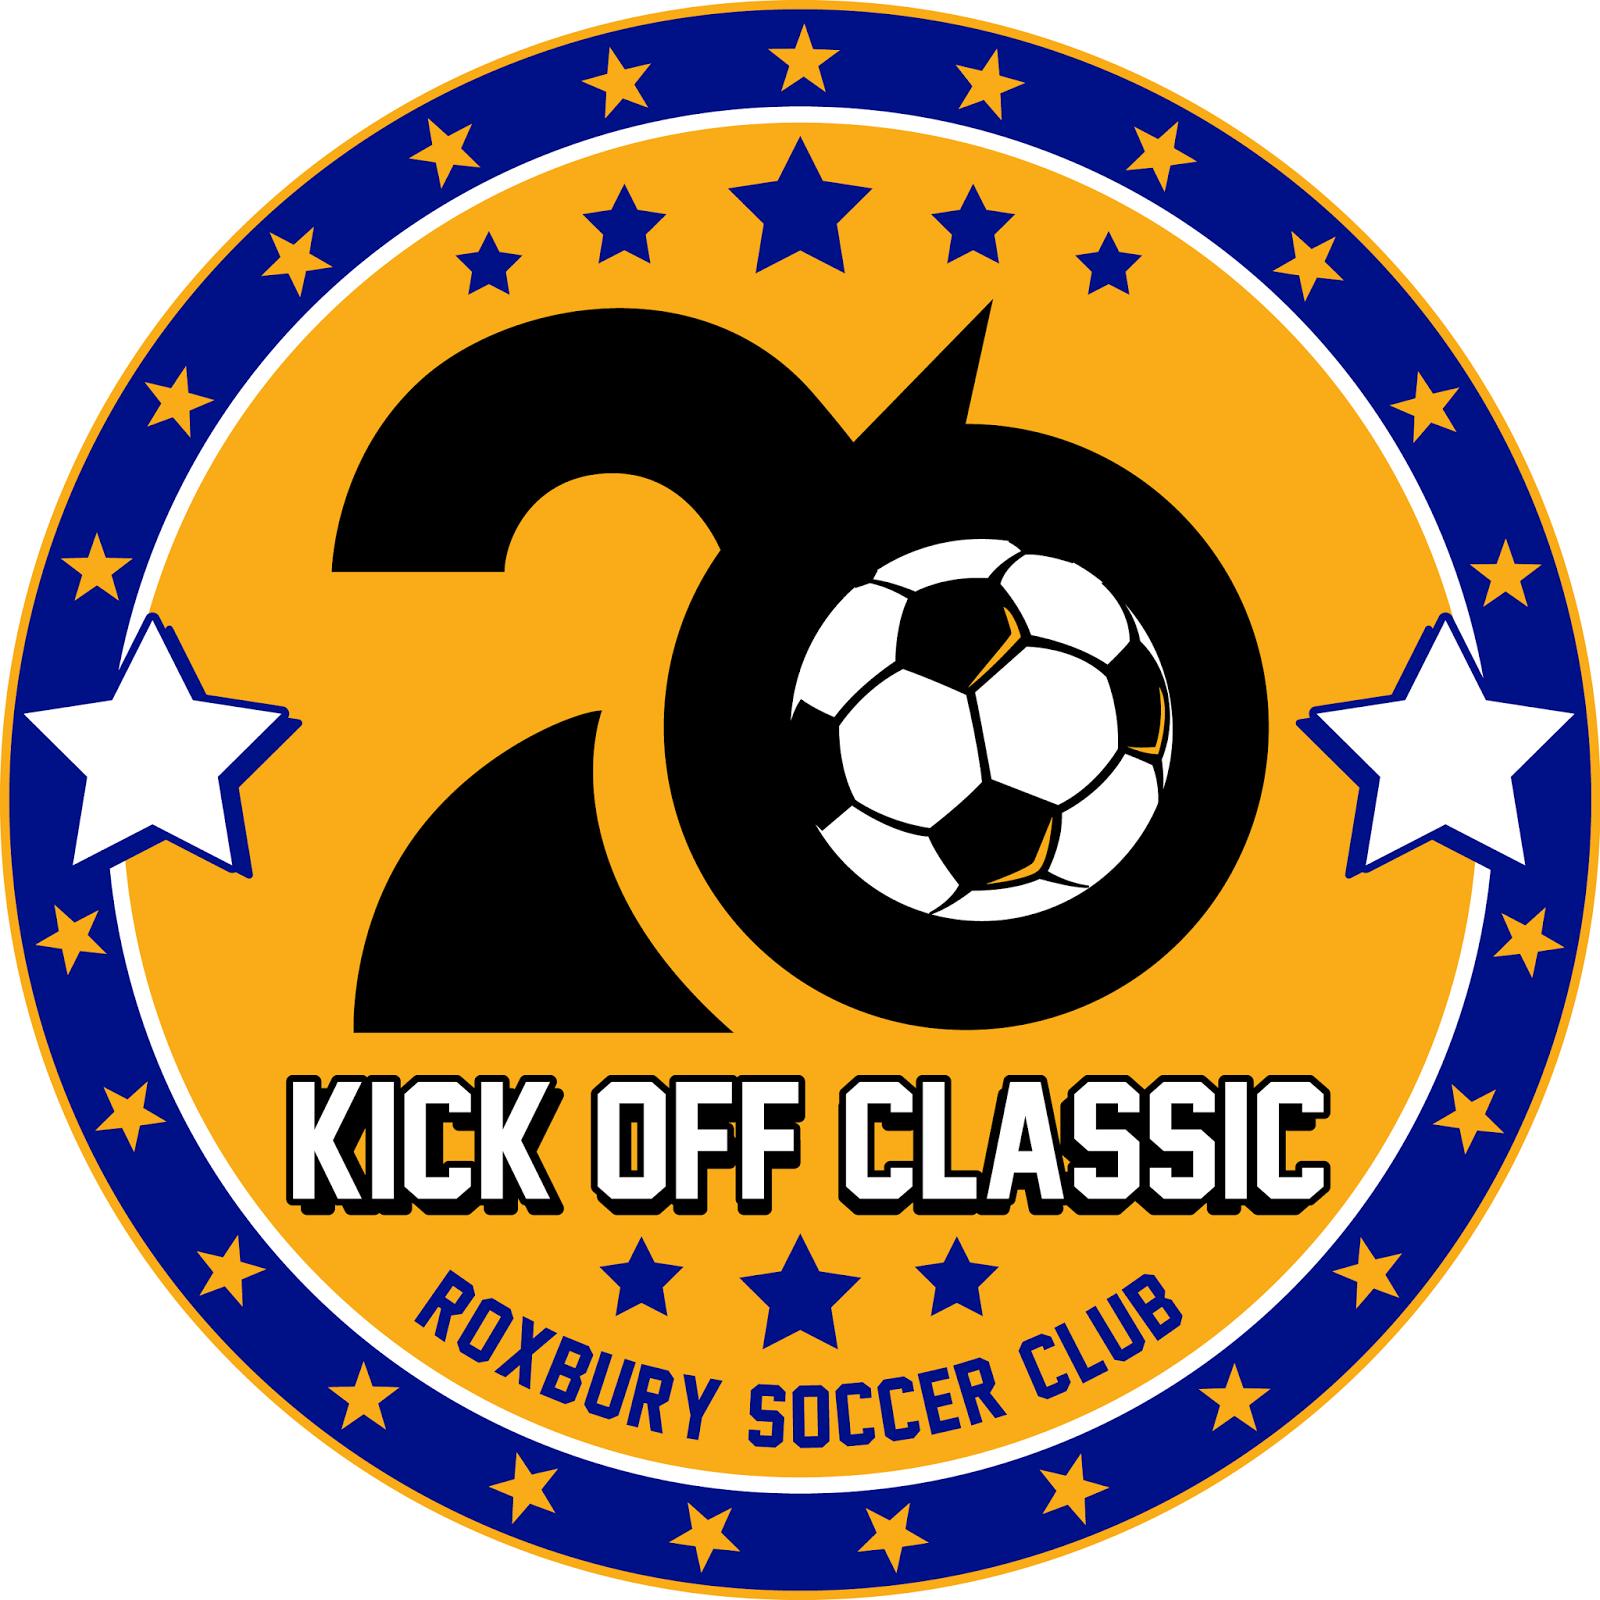 Roxbury soccer club kickoff classic home for Classic house kick